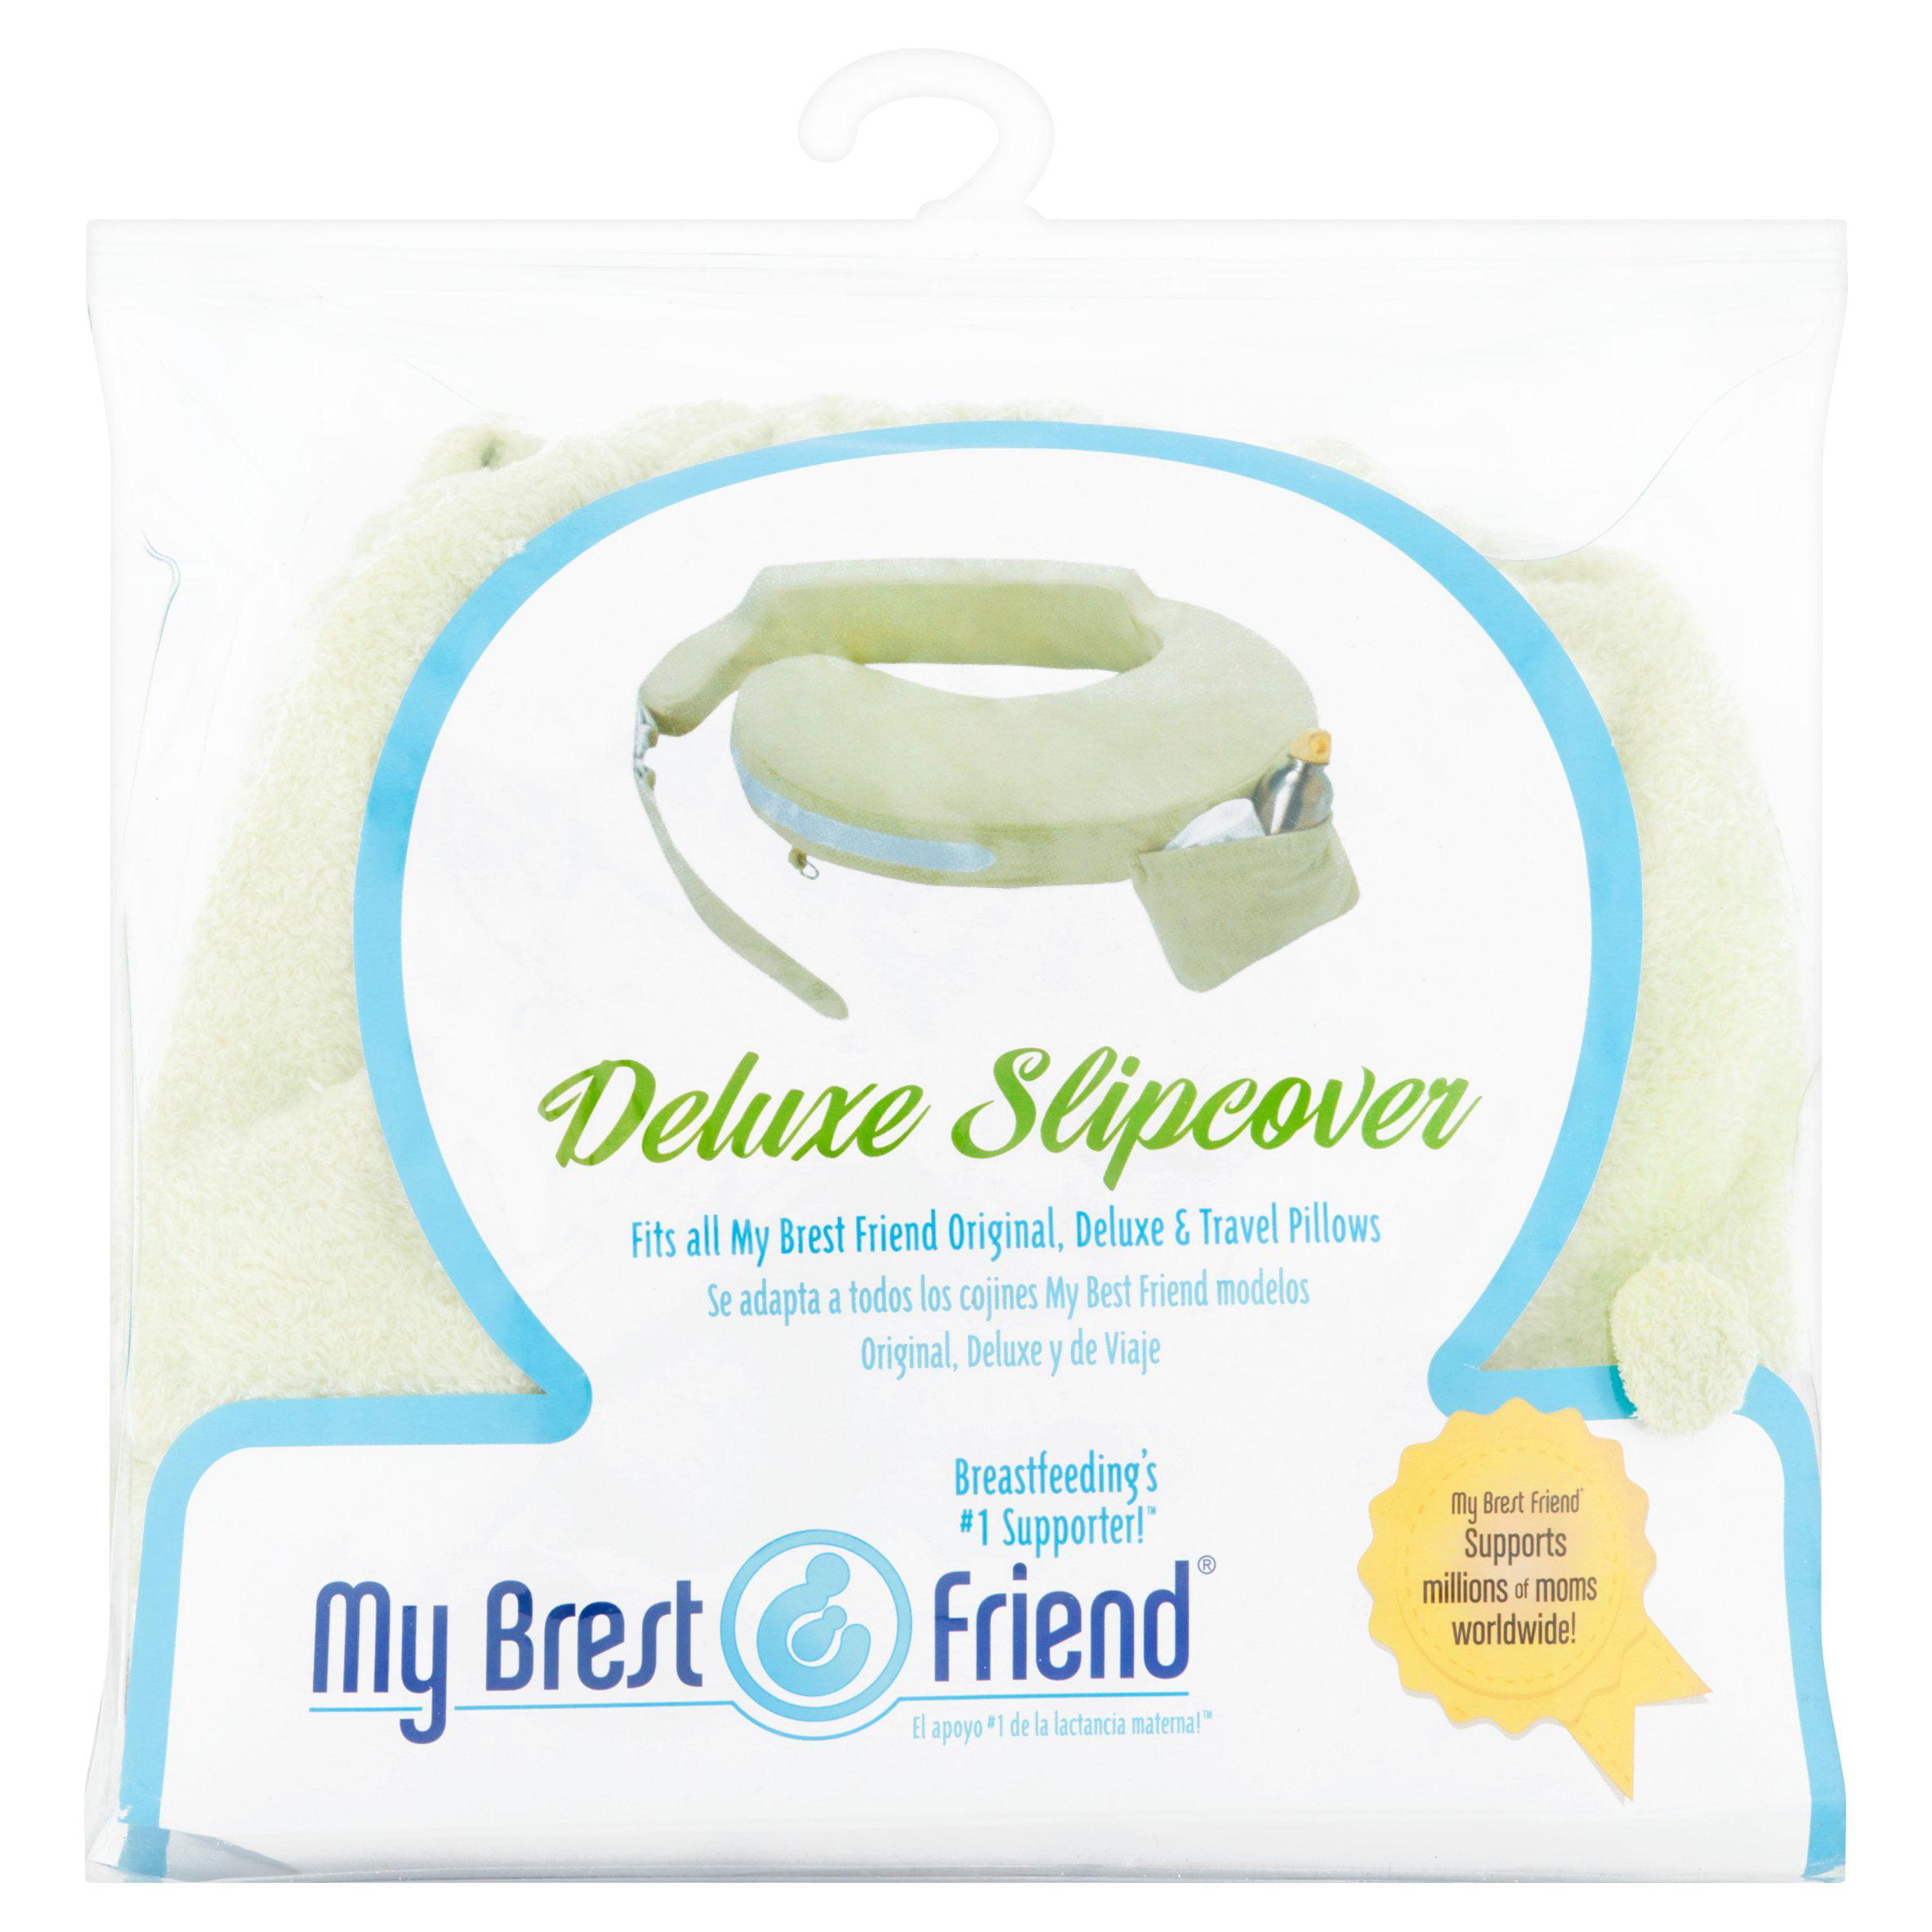 My Brest Friend Deluxe Slipcover - Walmart.com